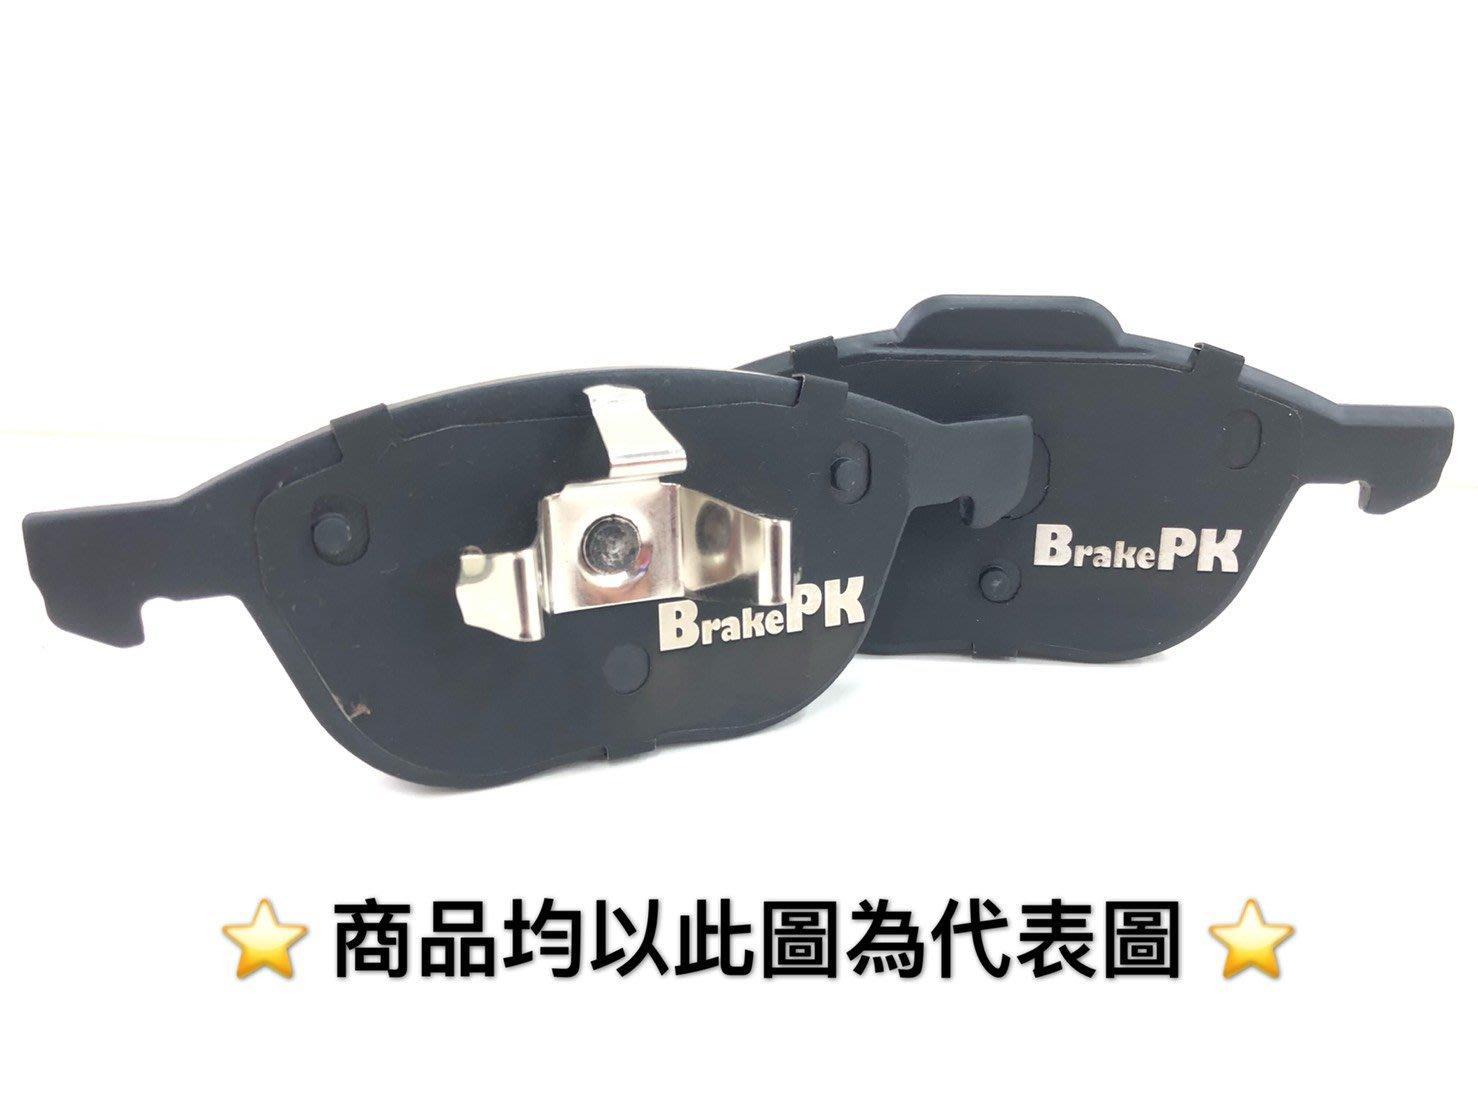 BrakePK - SUBARU 速霸路 Impreza 硬皮鯊 GC 前輪 來令片 - BPK00552 - 道路版